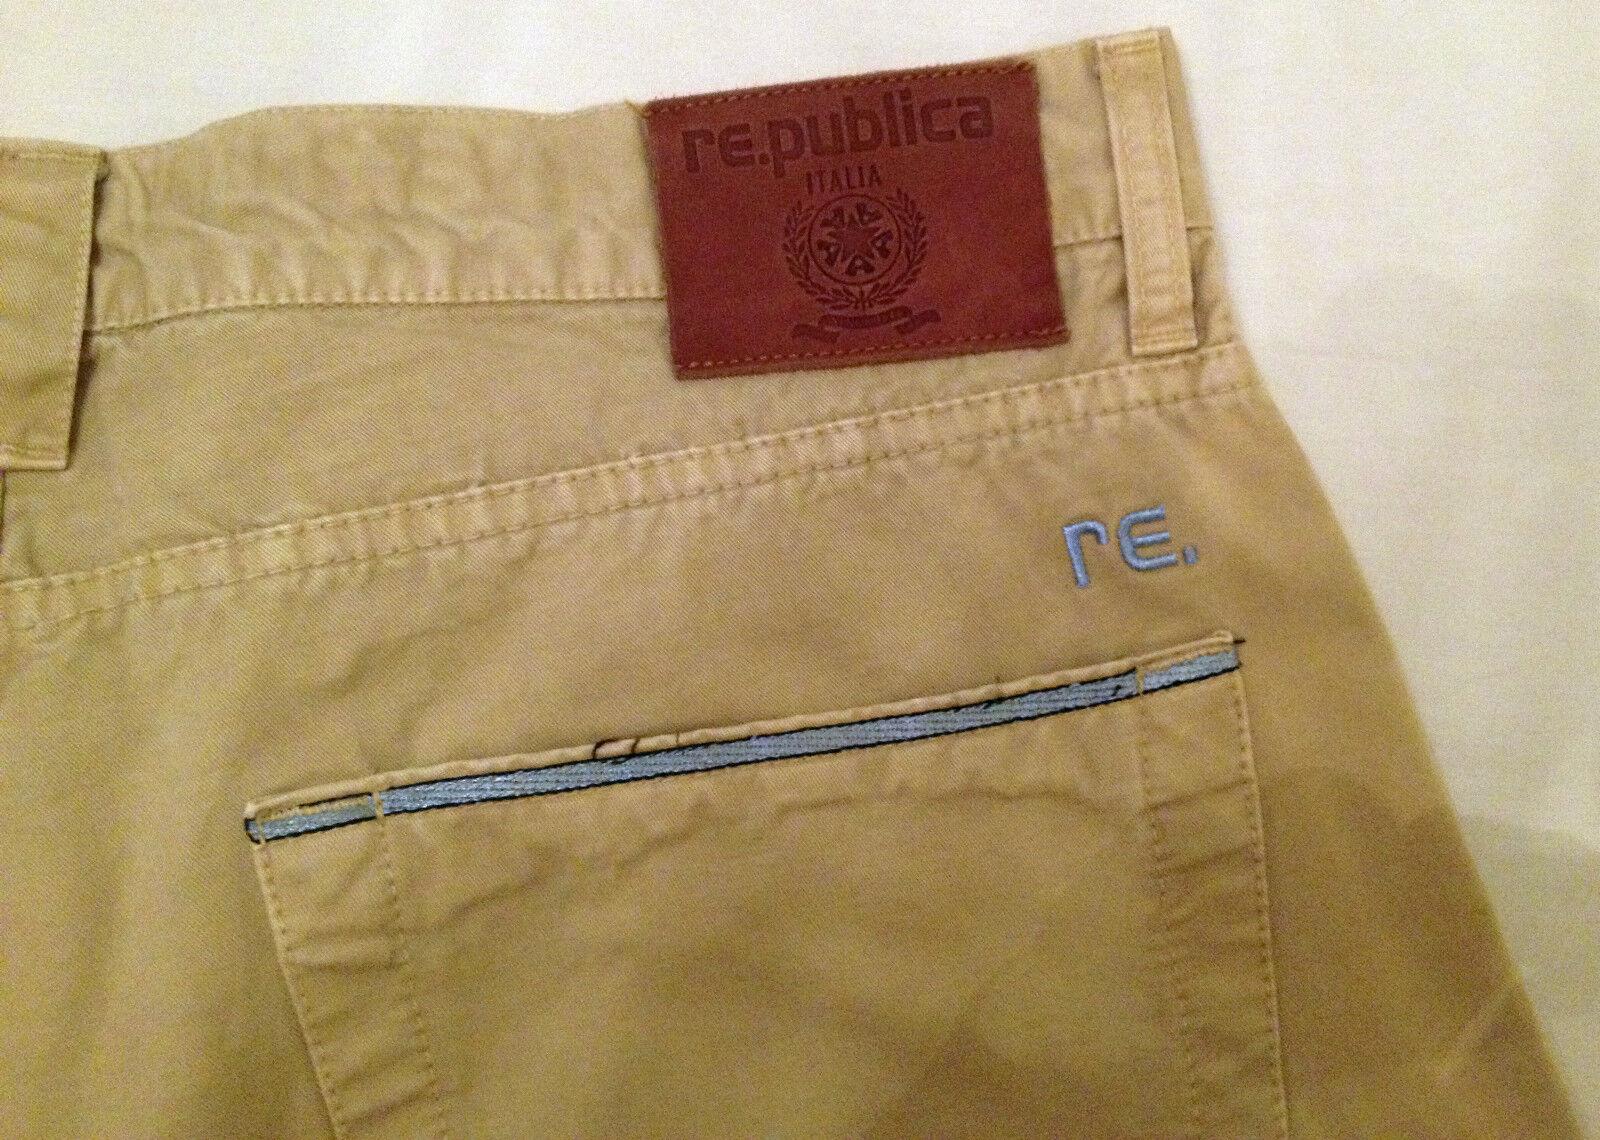 Pantaloni Jeans men Re.publica 1946 men MAN tg.36